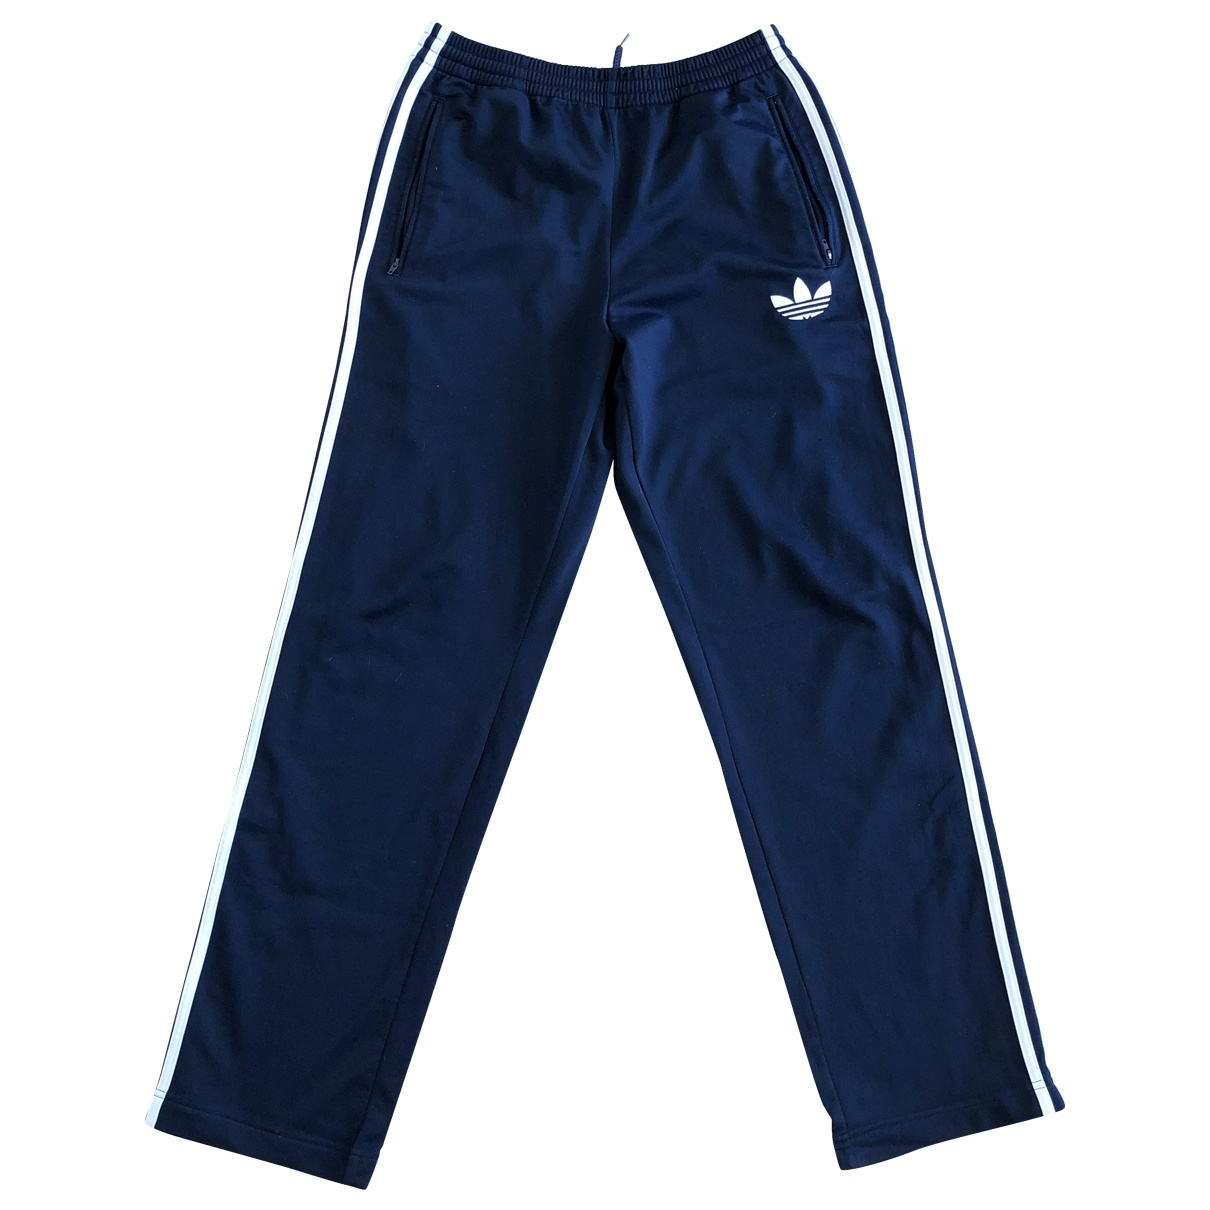 Adidas \N Blue Trousers for Men S International